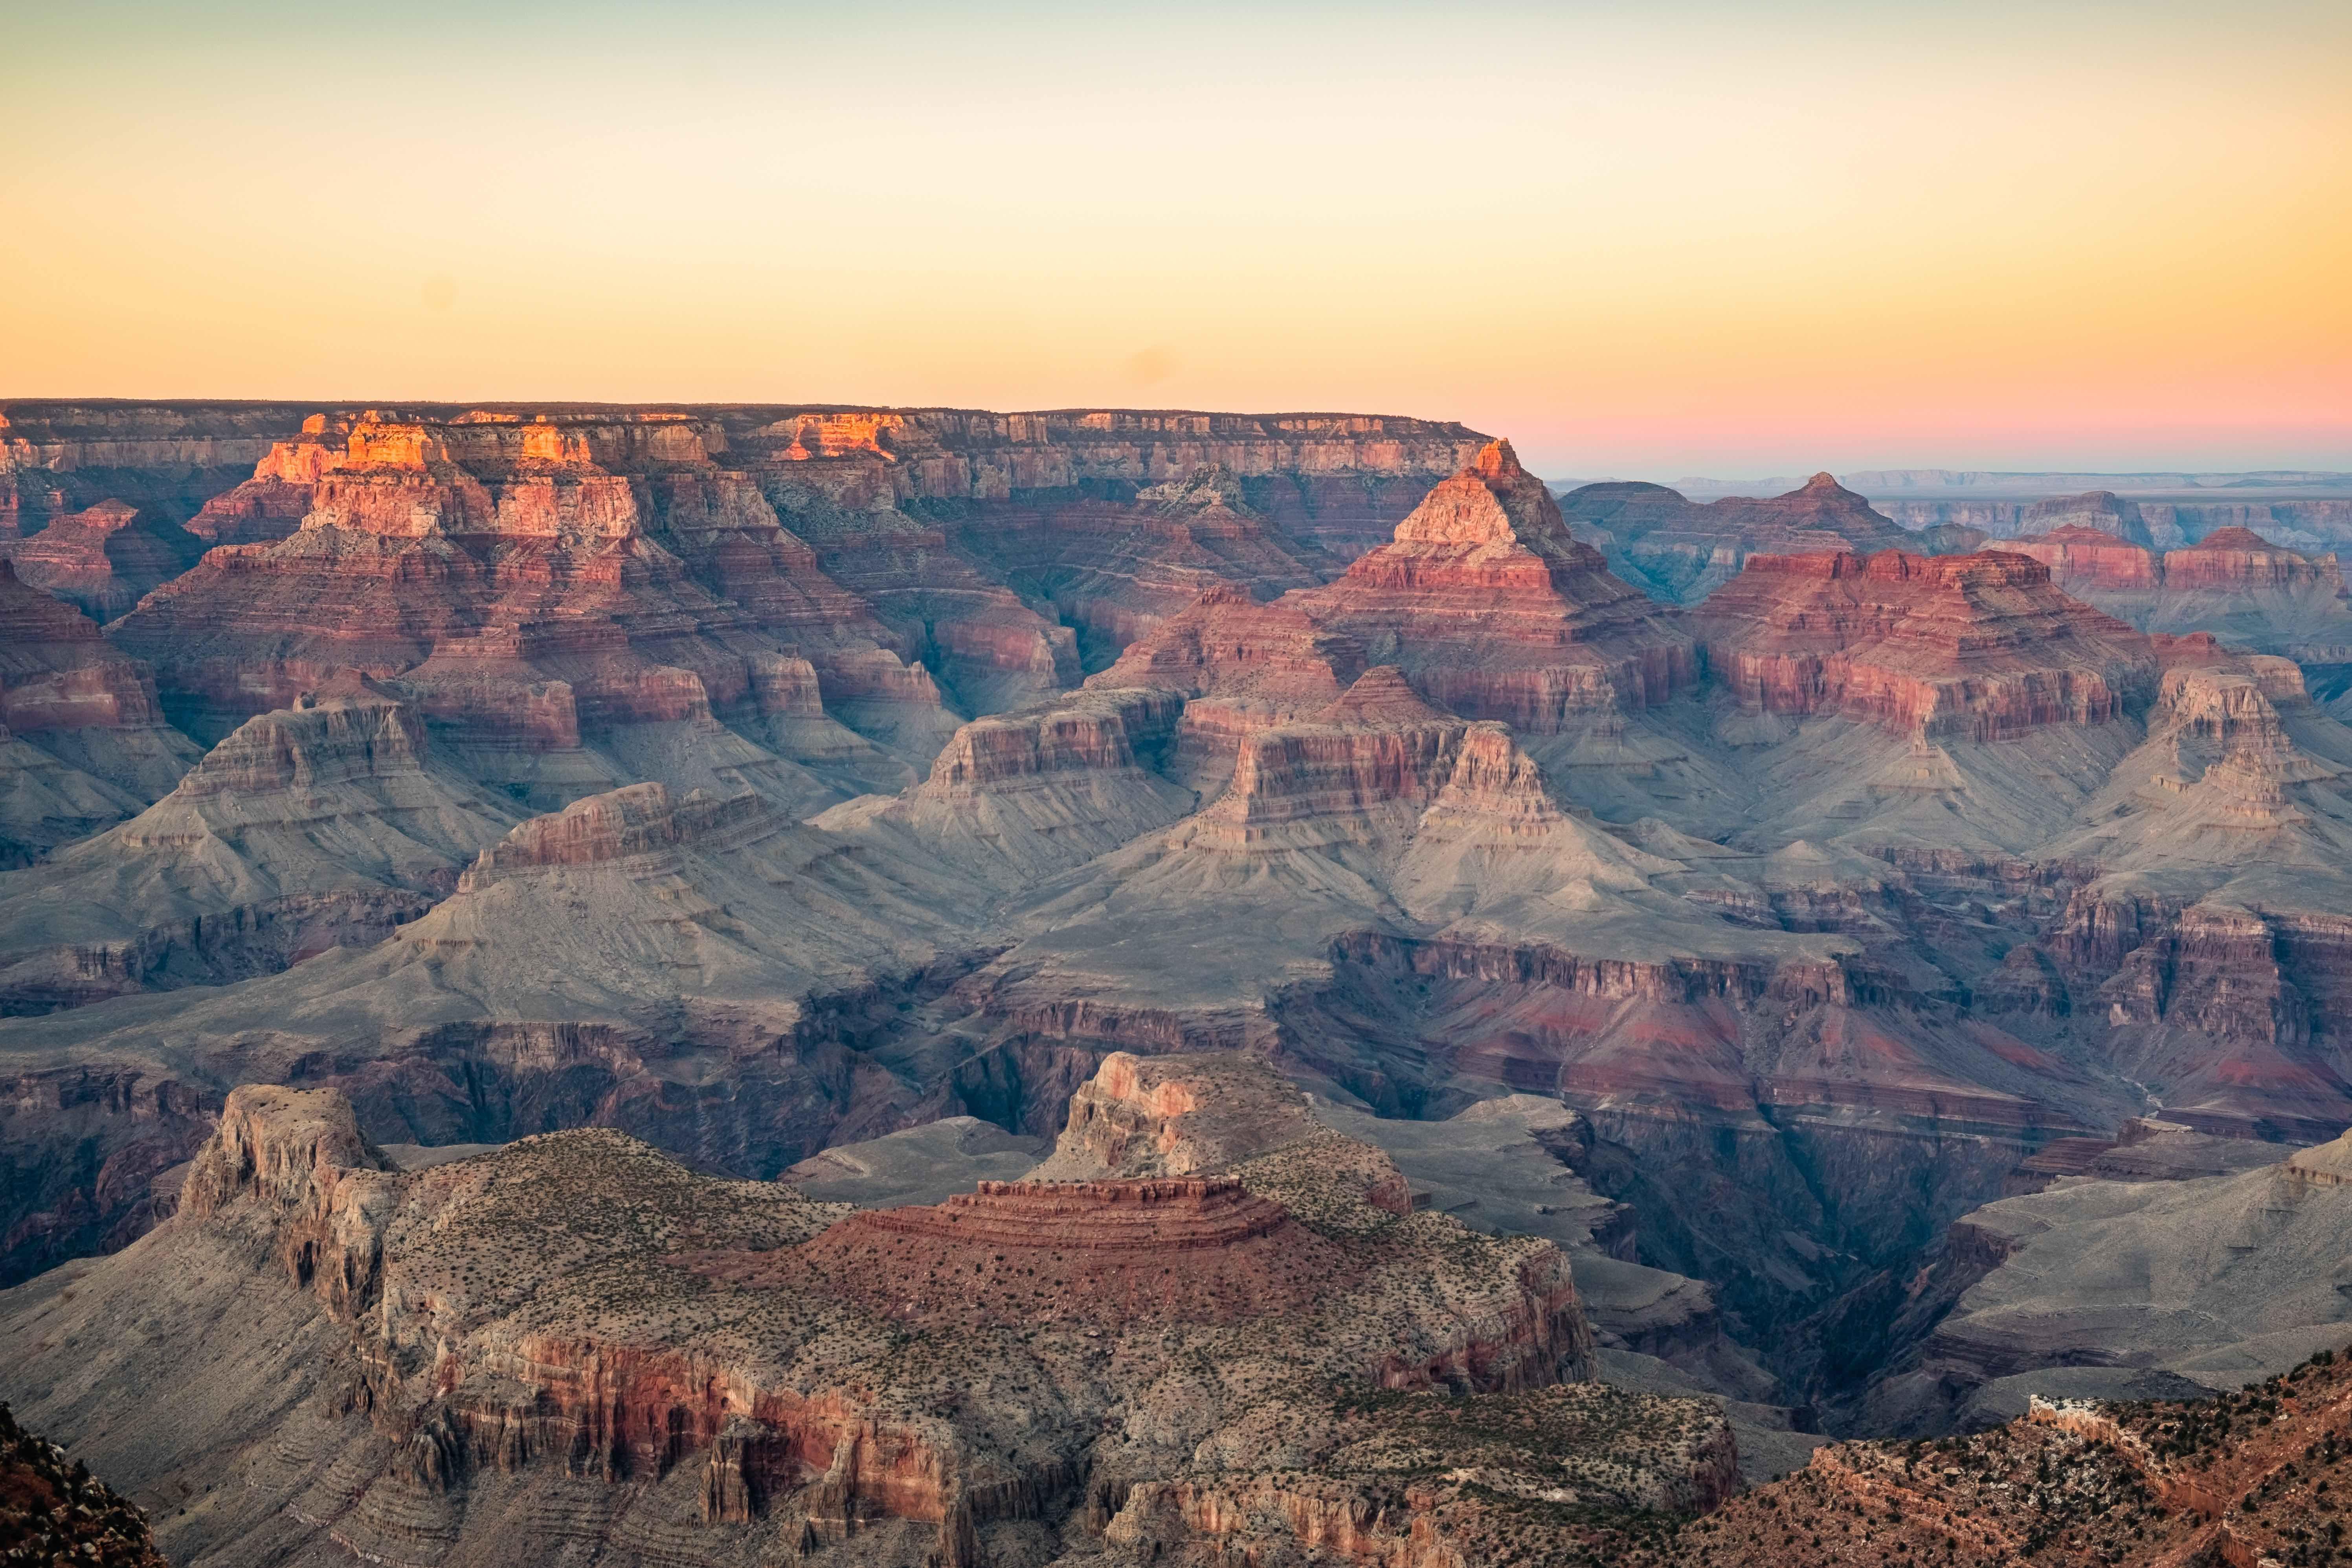 Grand Canyon – Parashant